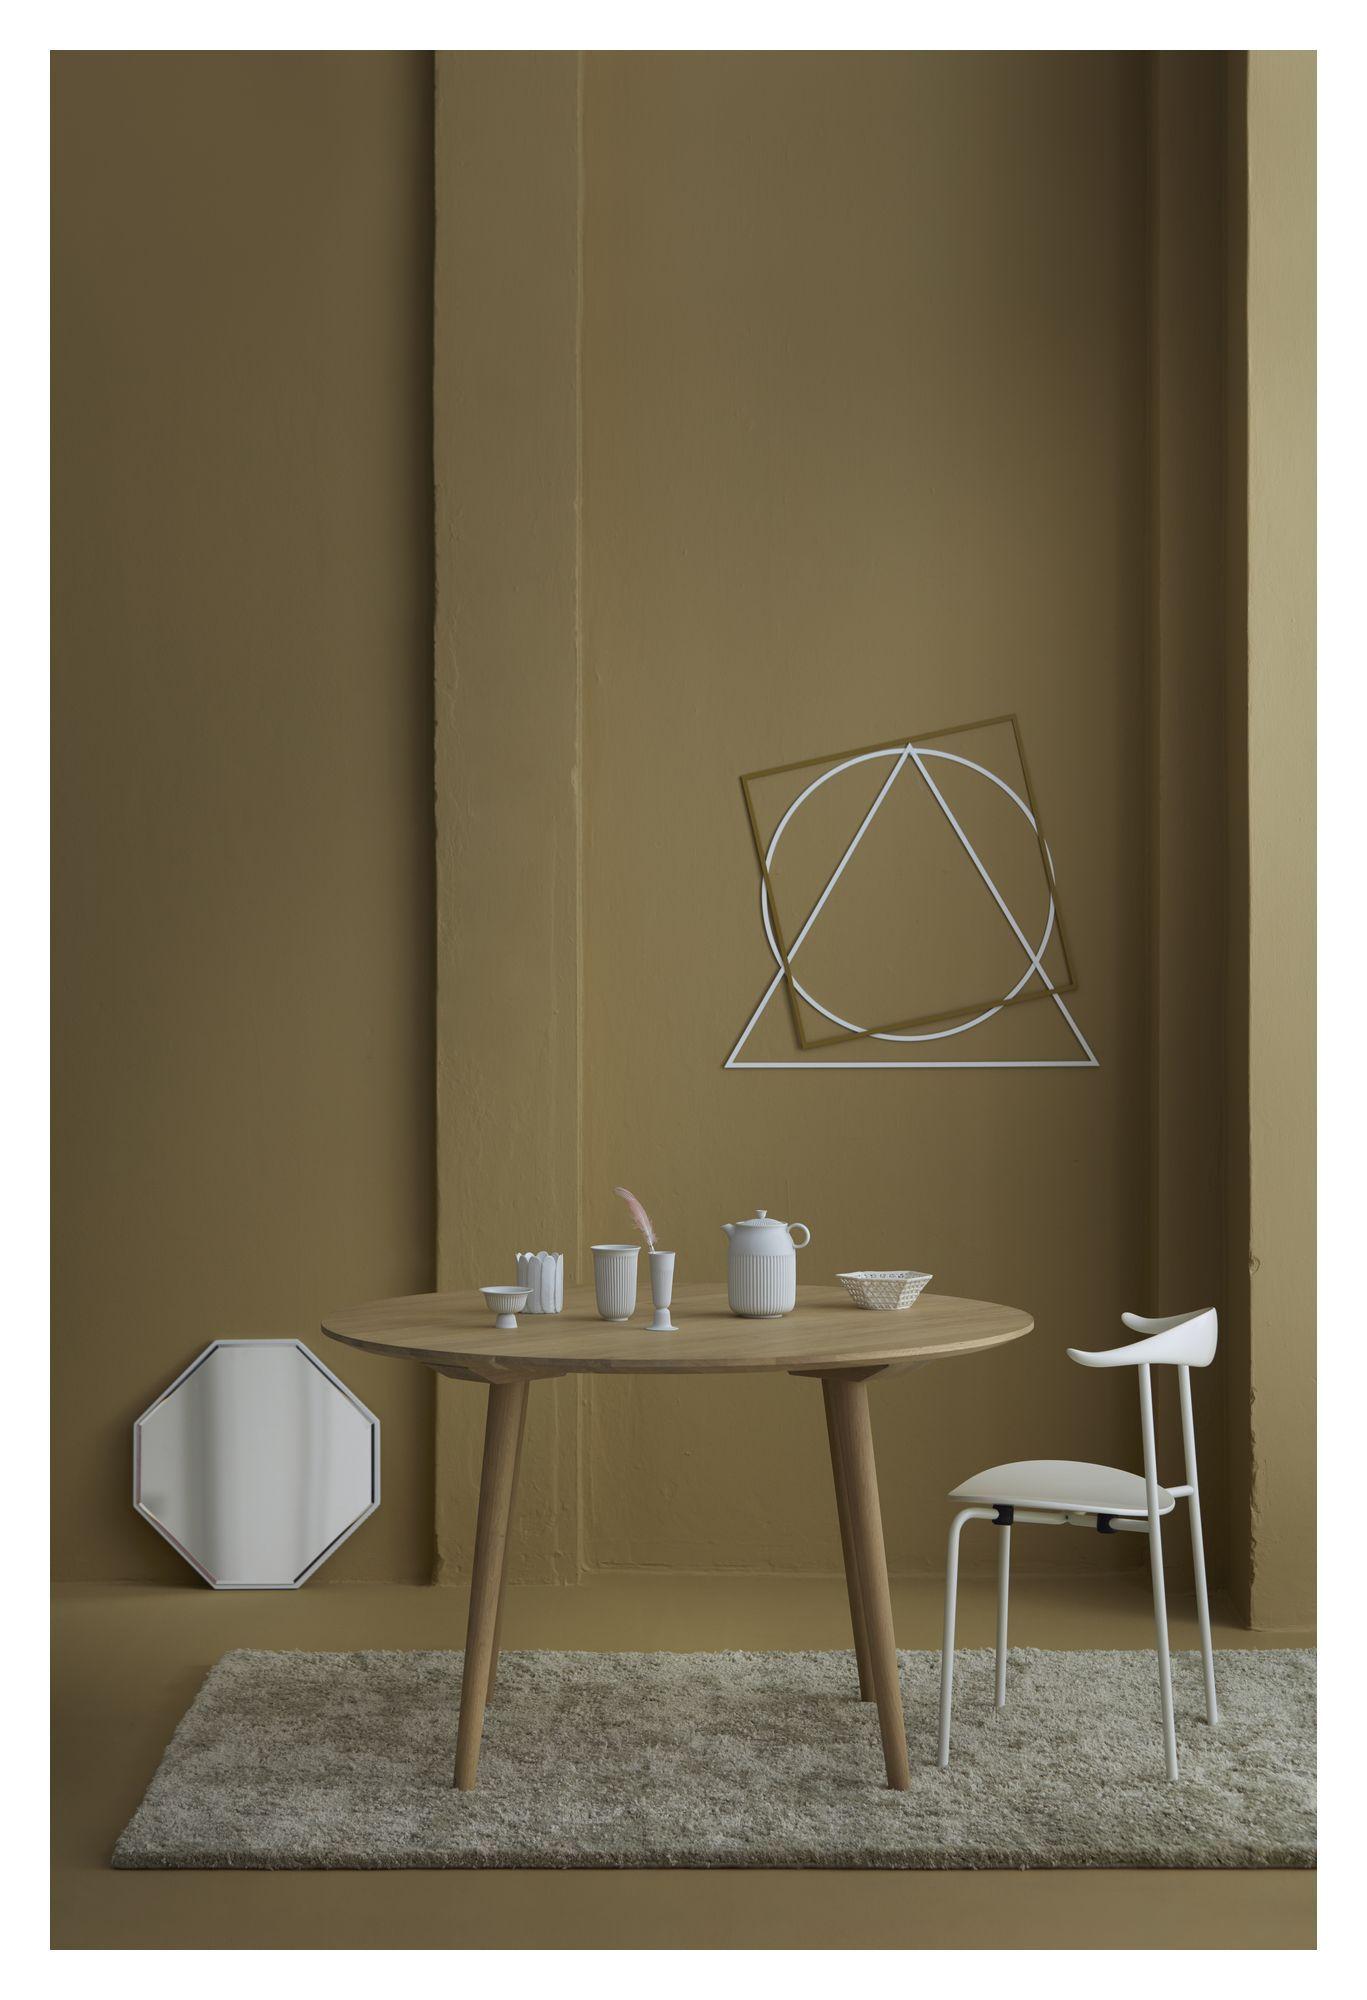 Fabula Gjall tæppe - Beige - Håndvævet Luvtæppe  160x230 cm